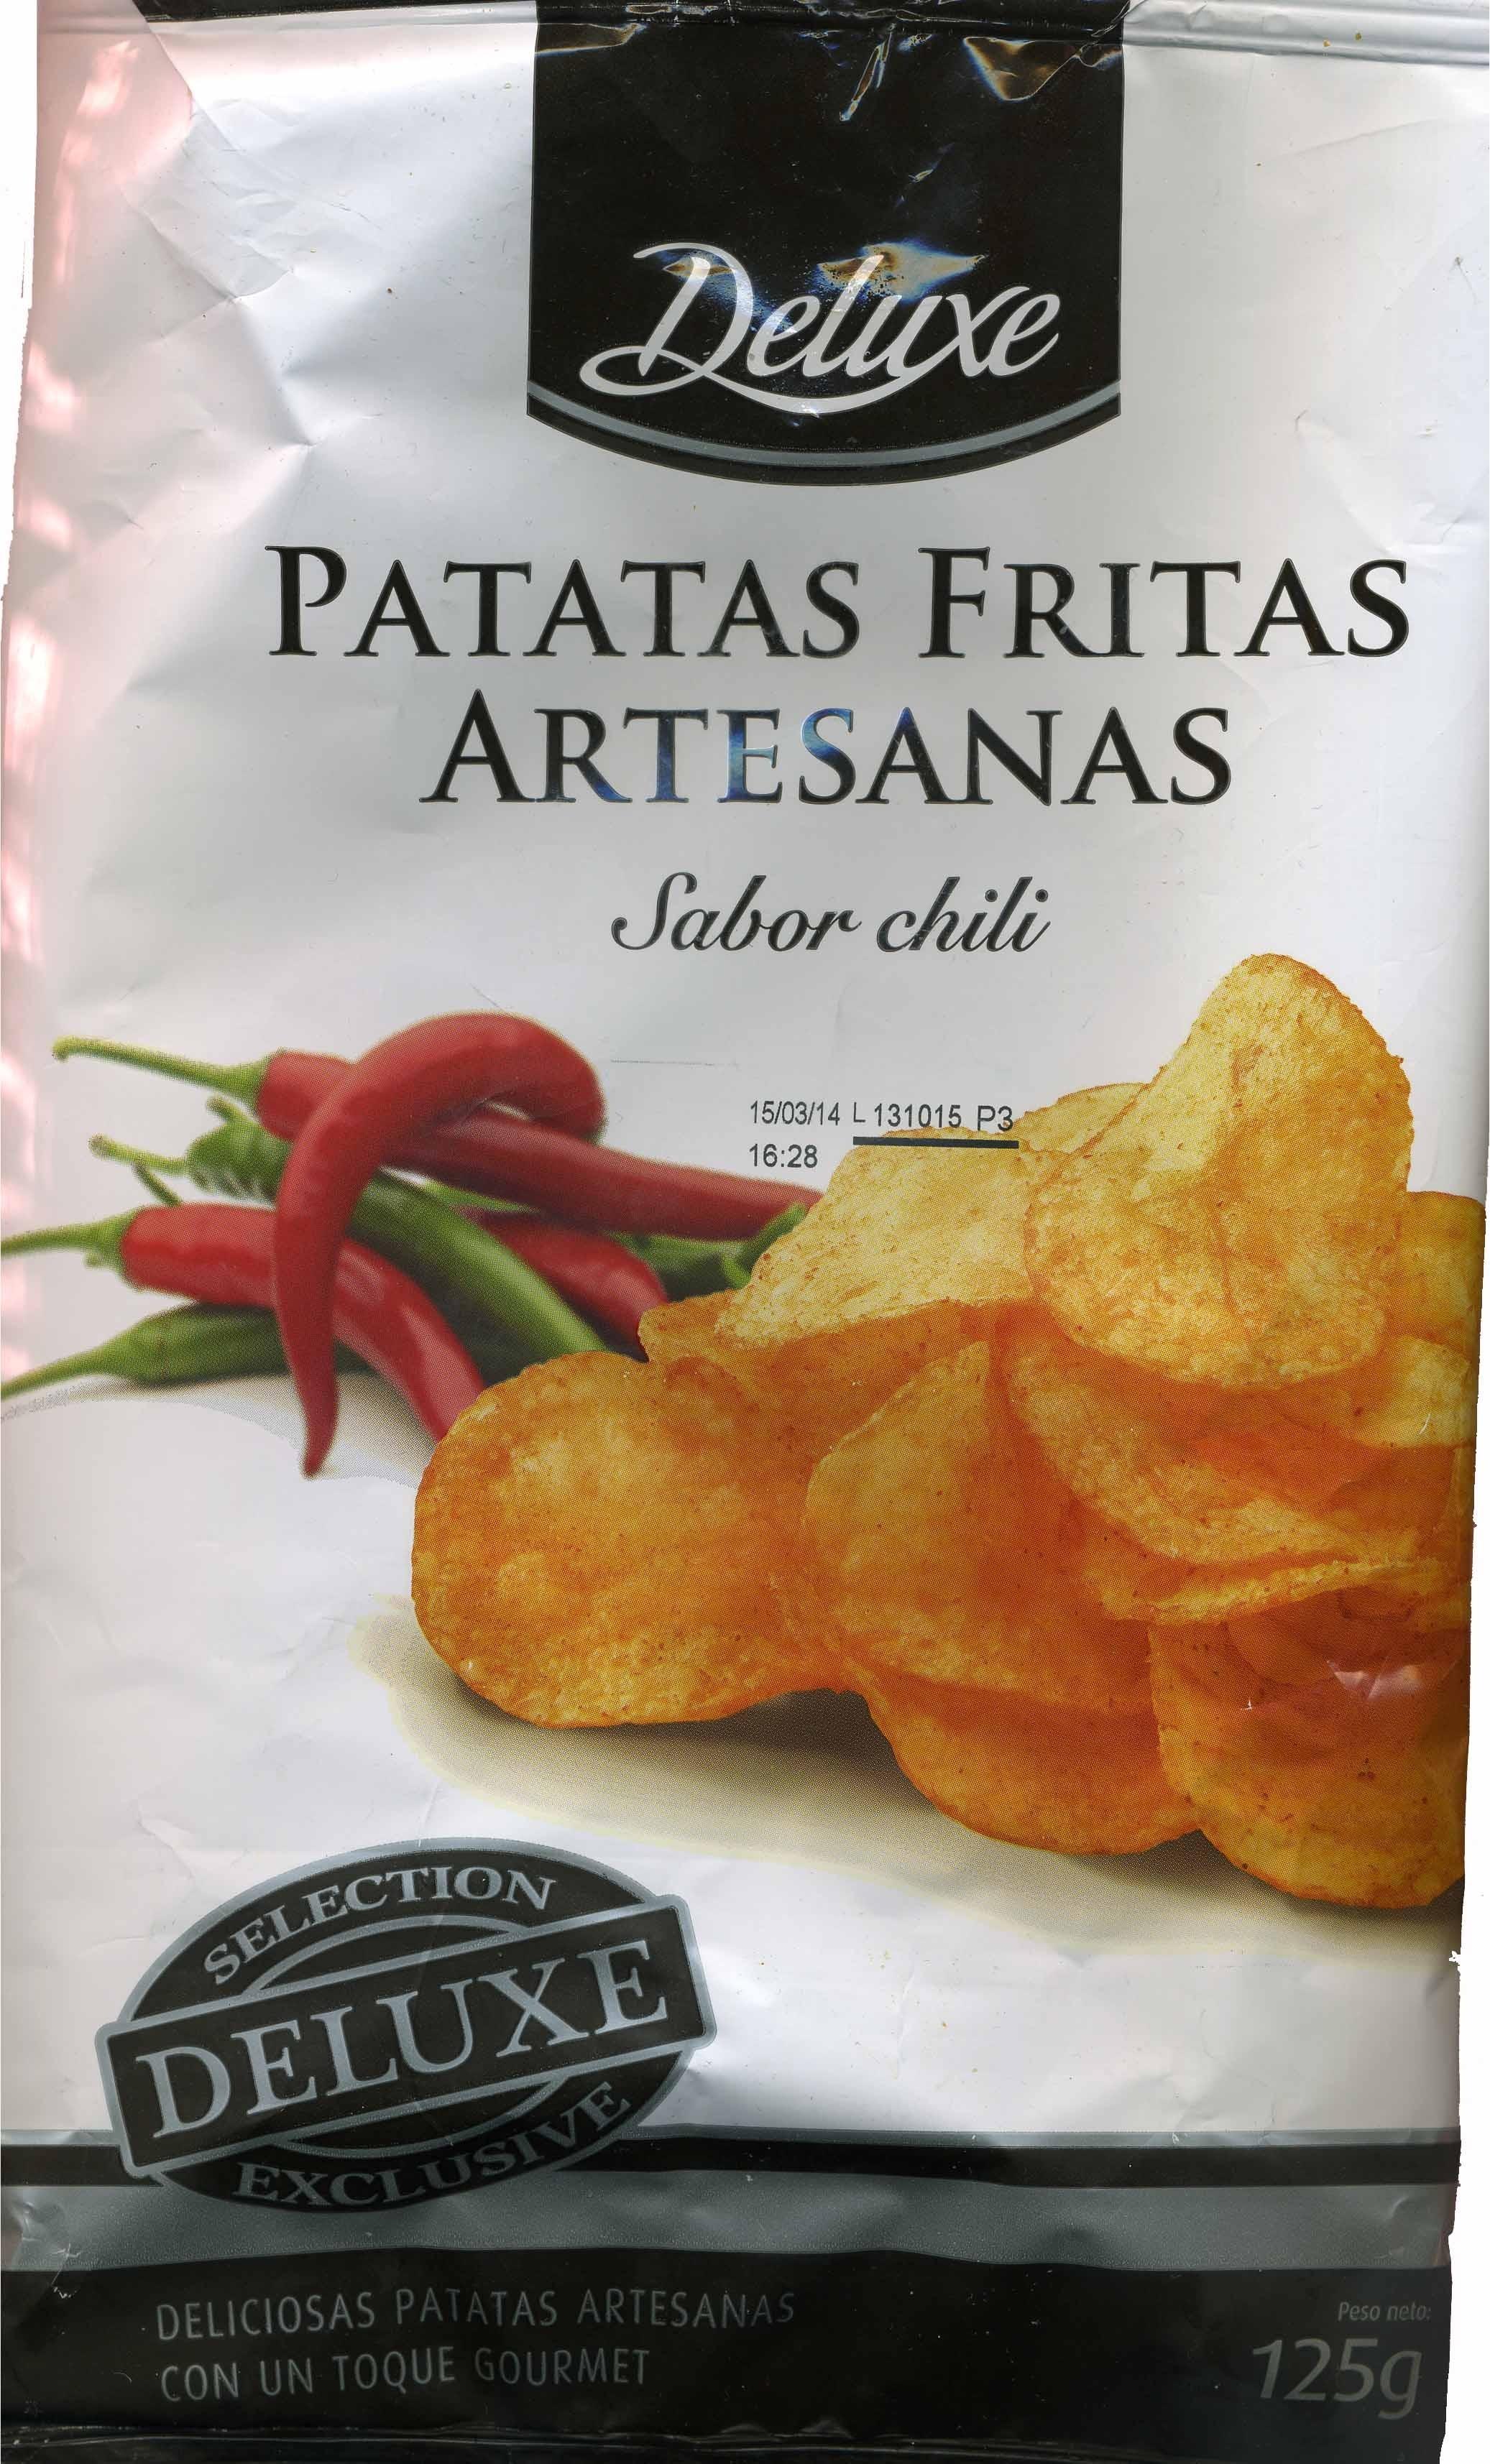 Patatas fritas artesanas sabor chili - Product - es